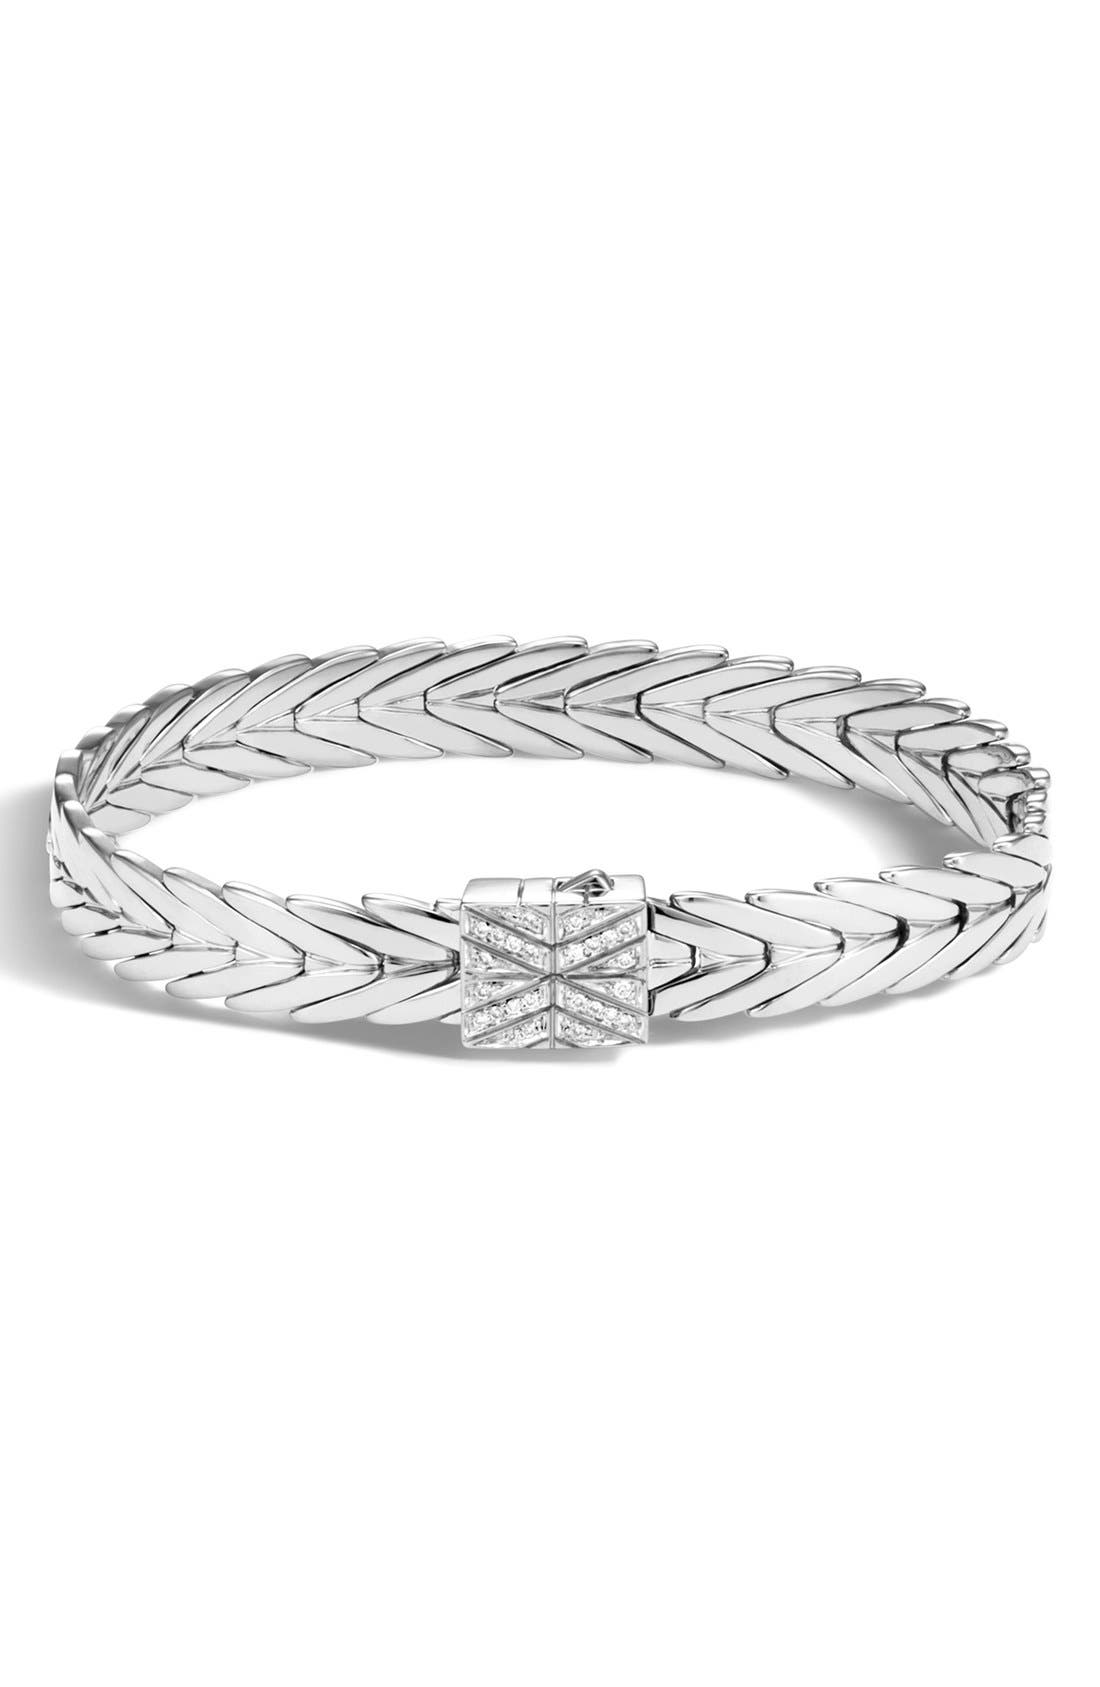 Modern Chain 8mm Bracelet,                         Main,                         color, Silver/Diamond